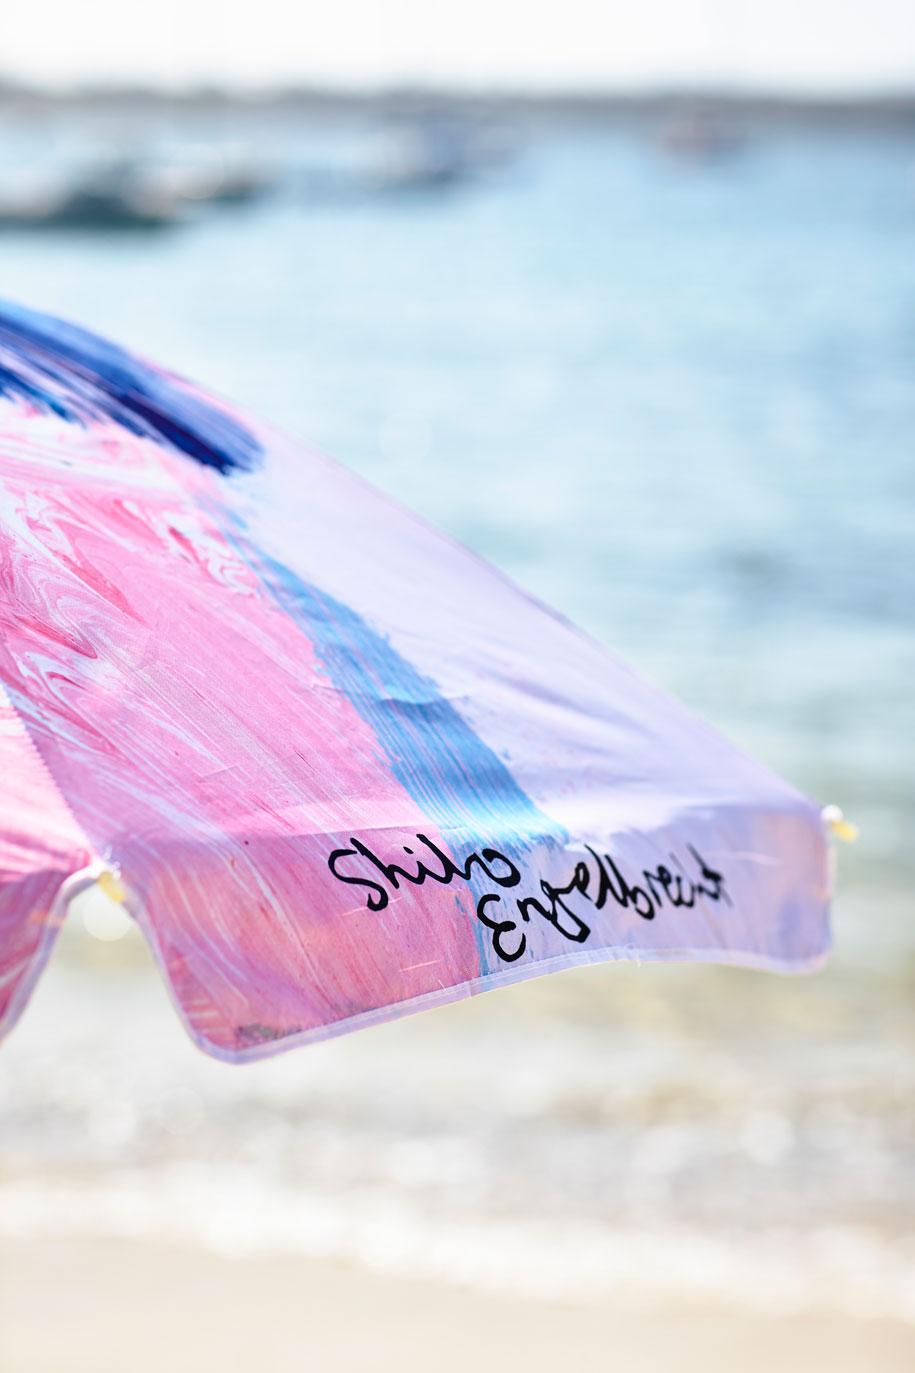 Sportscraft,-Shilo-Umbrella,-$99